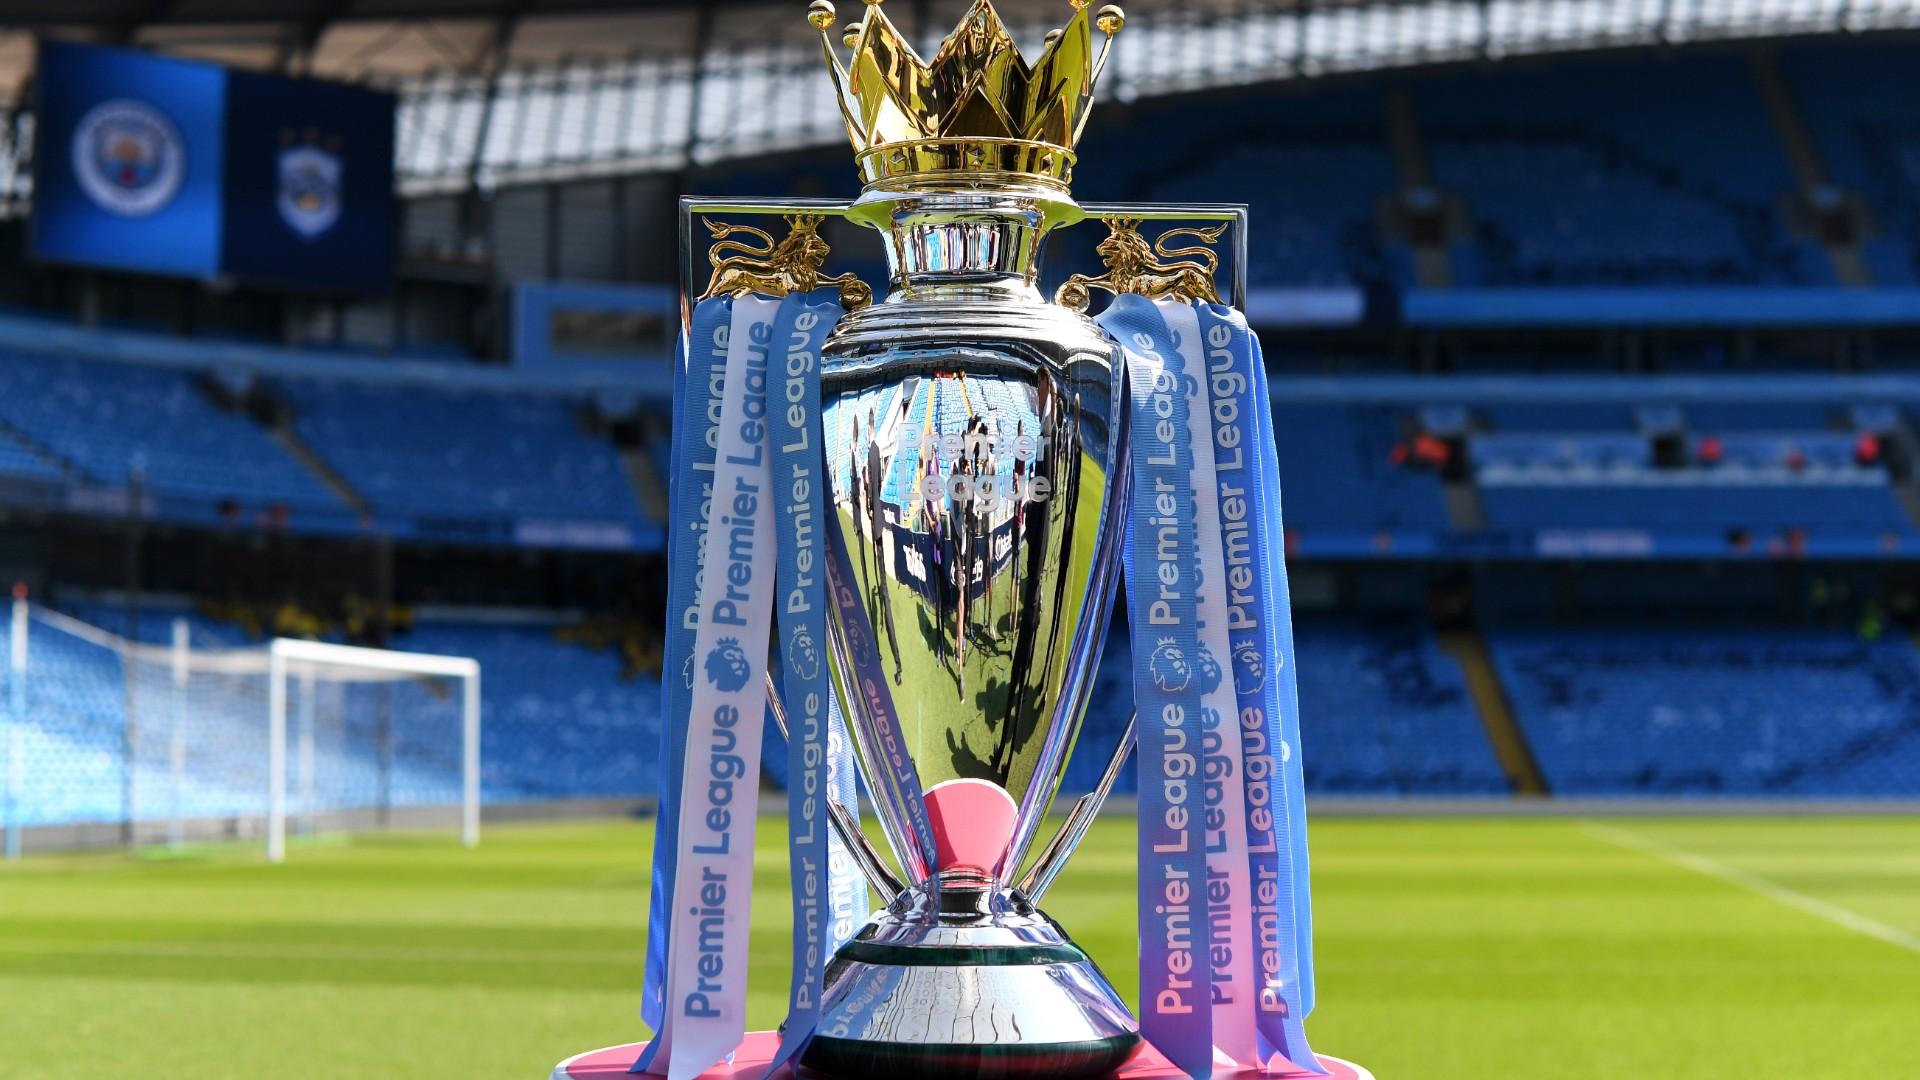 Palpites Para 3ª Rodada Do Campeonato Ingles 2020 2021 Palpites De Futebol Hoje